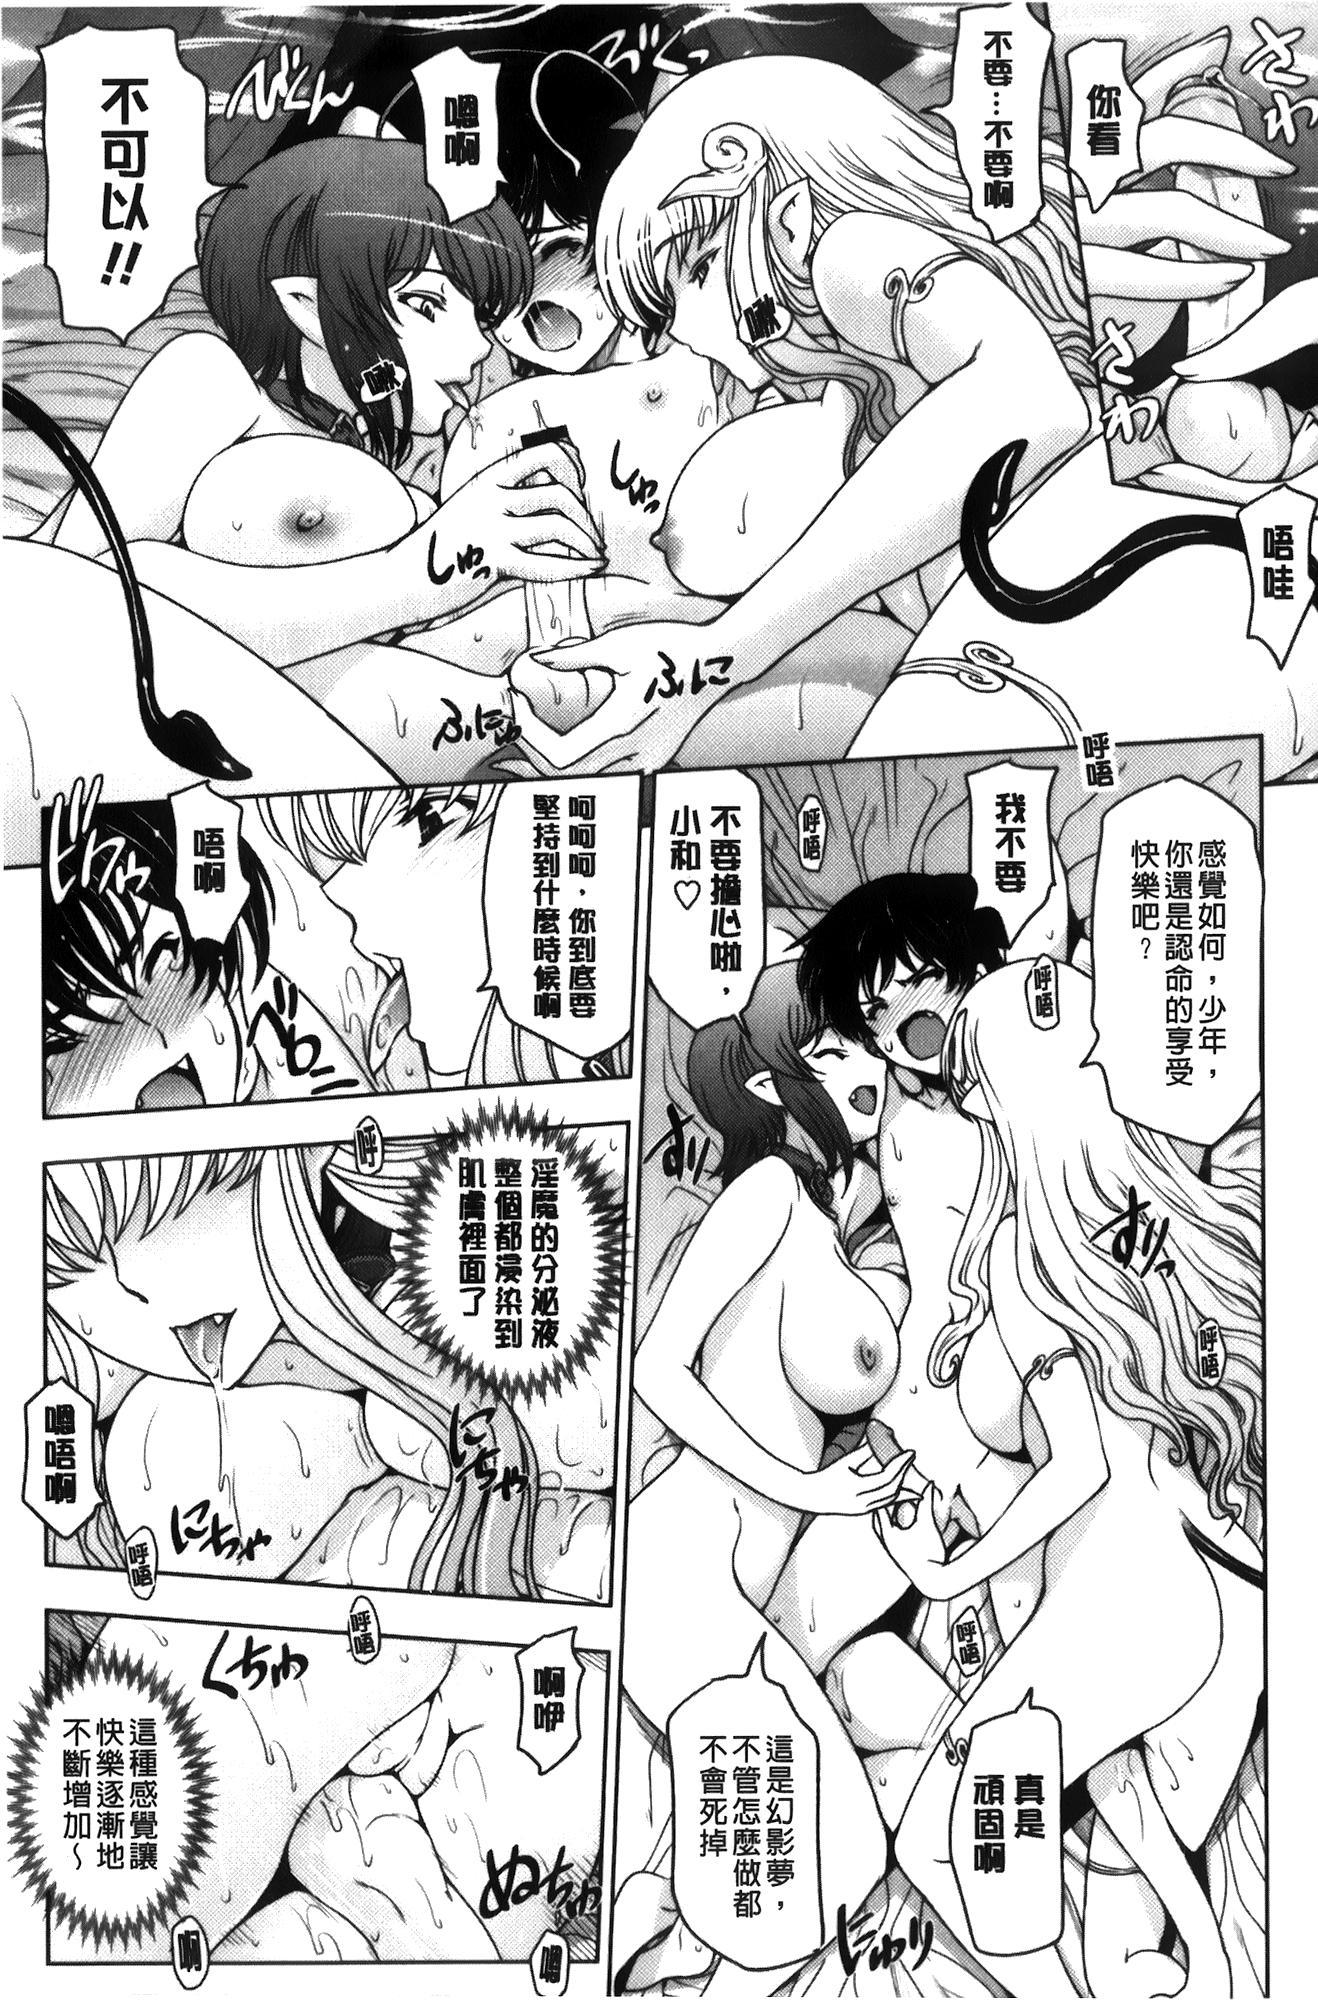 Majo × Shota ~ Genteiban | 魔女X小正太 限定版 119